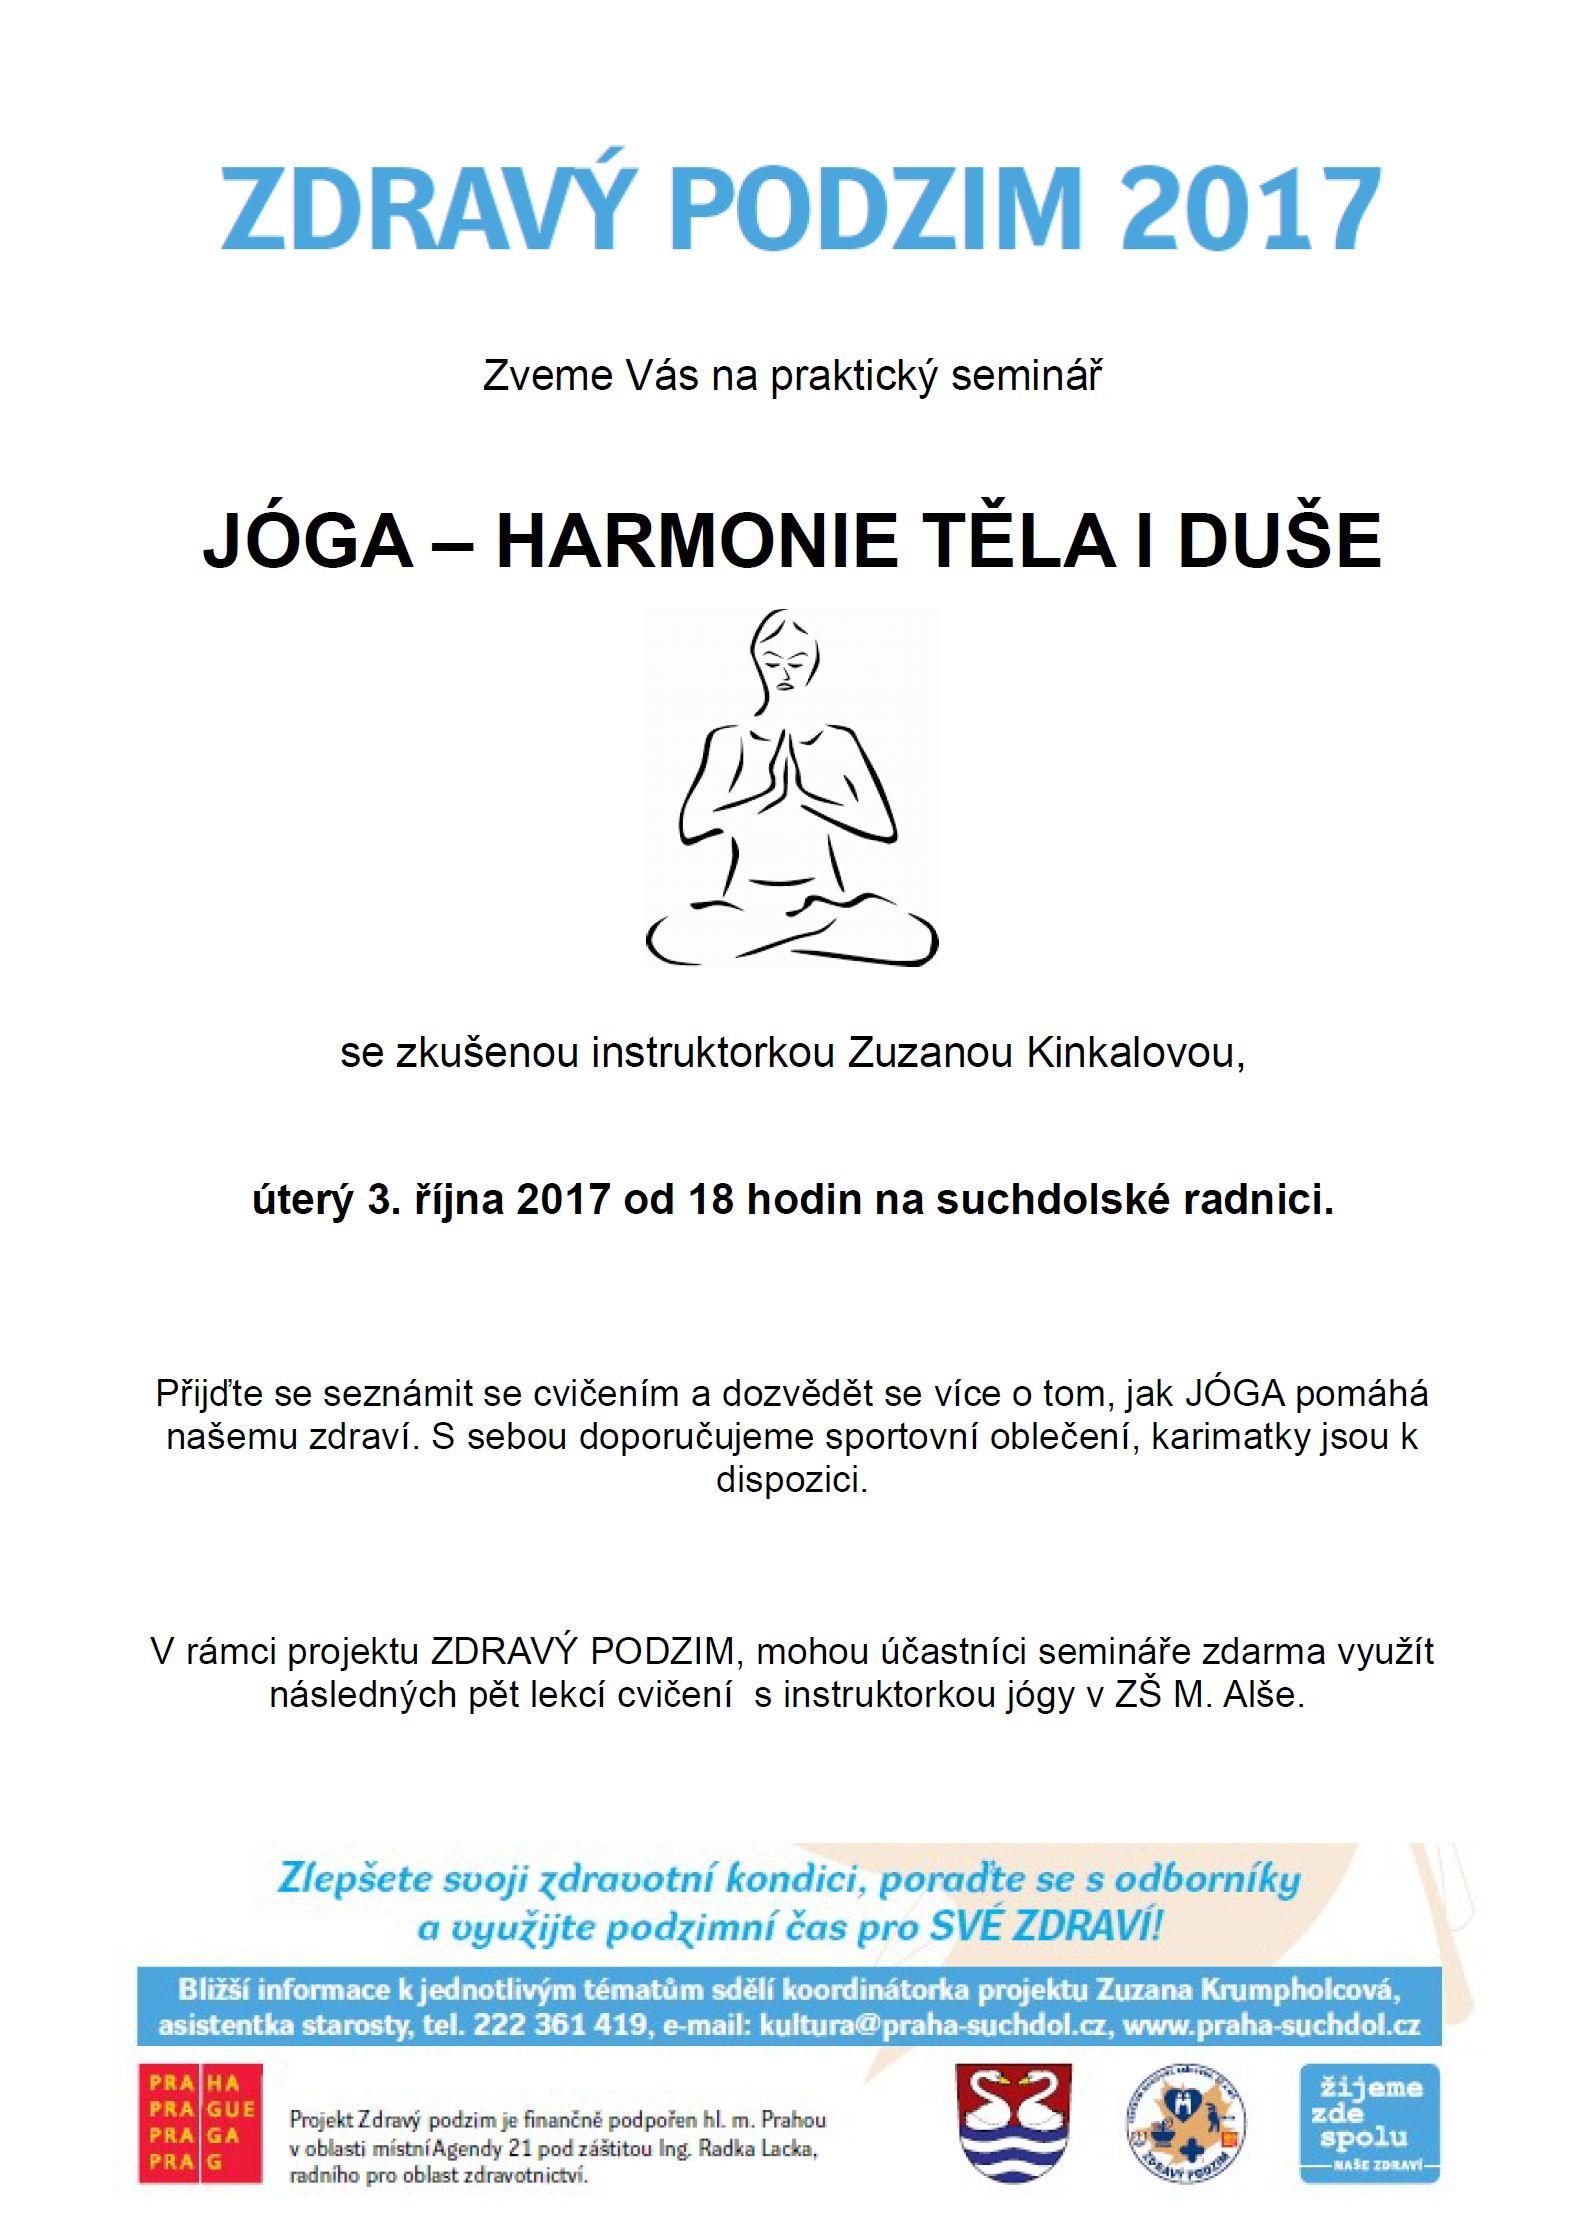 Jóga, praktický seminář - 3.10.2017 Zdravý podzim